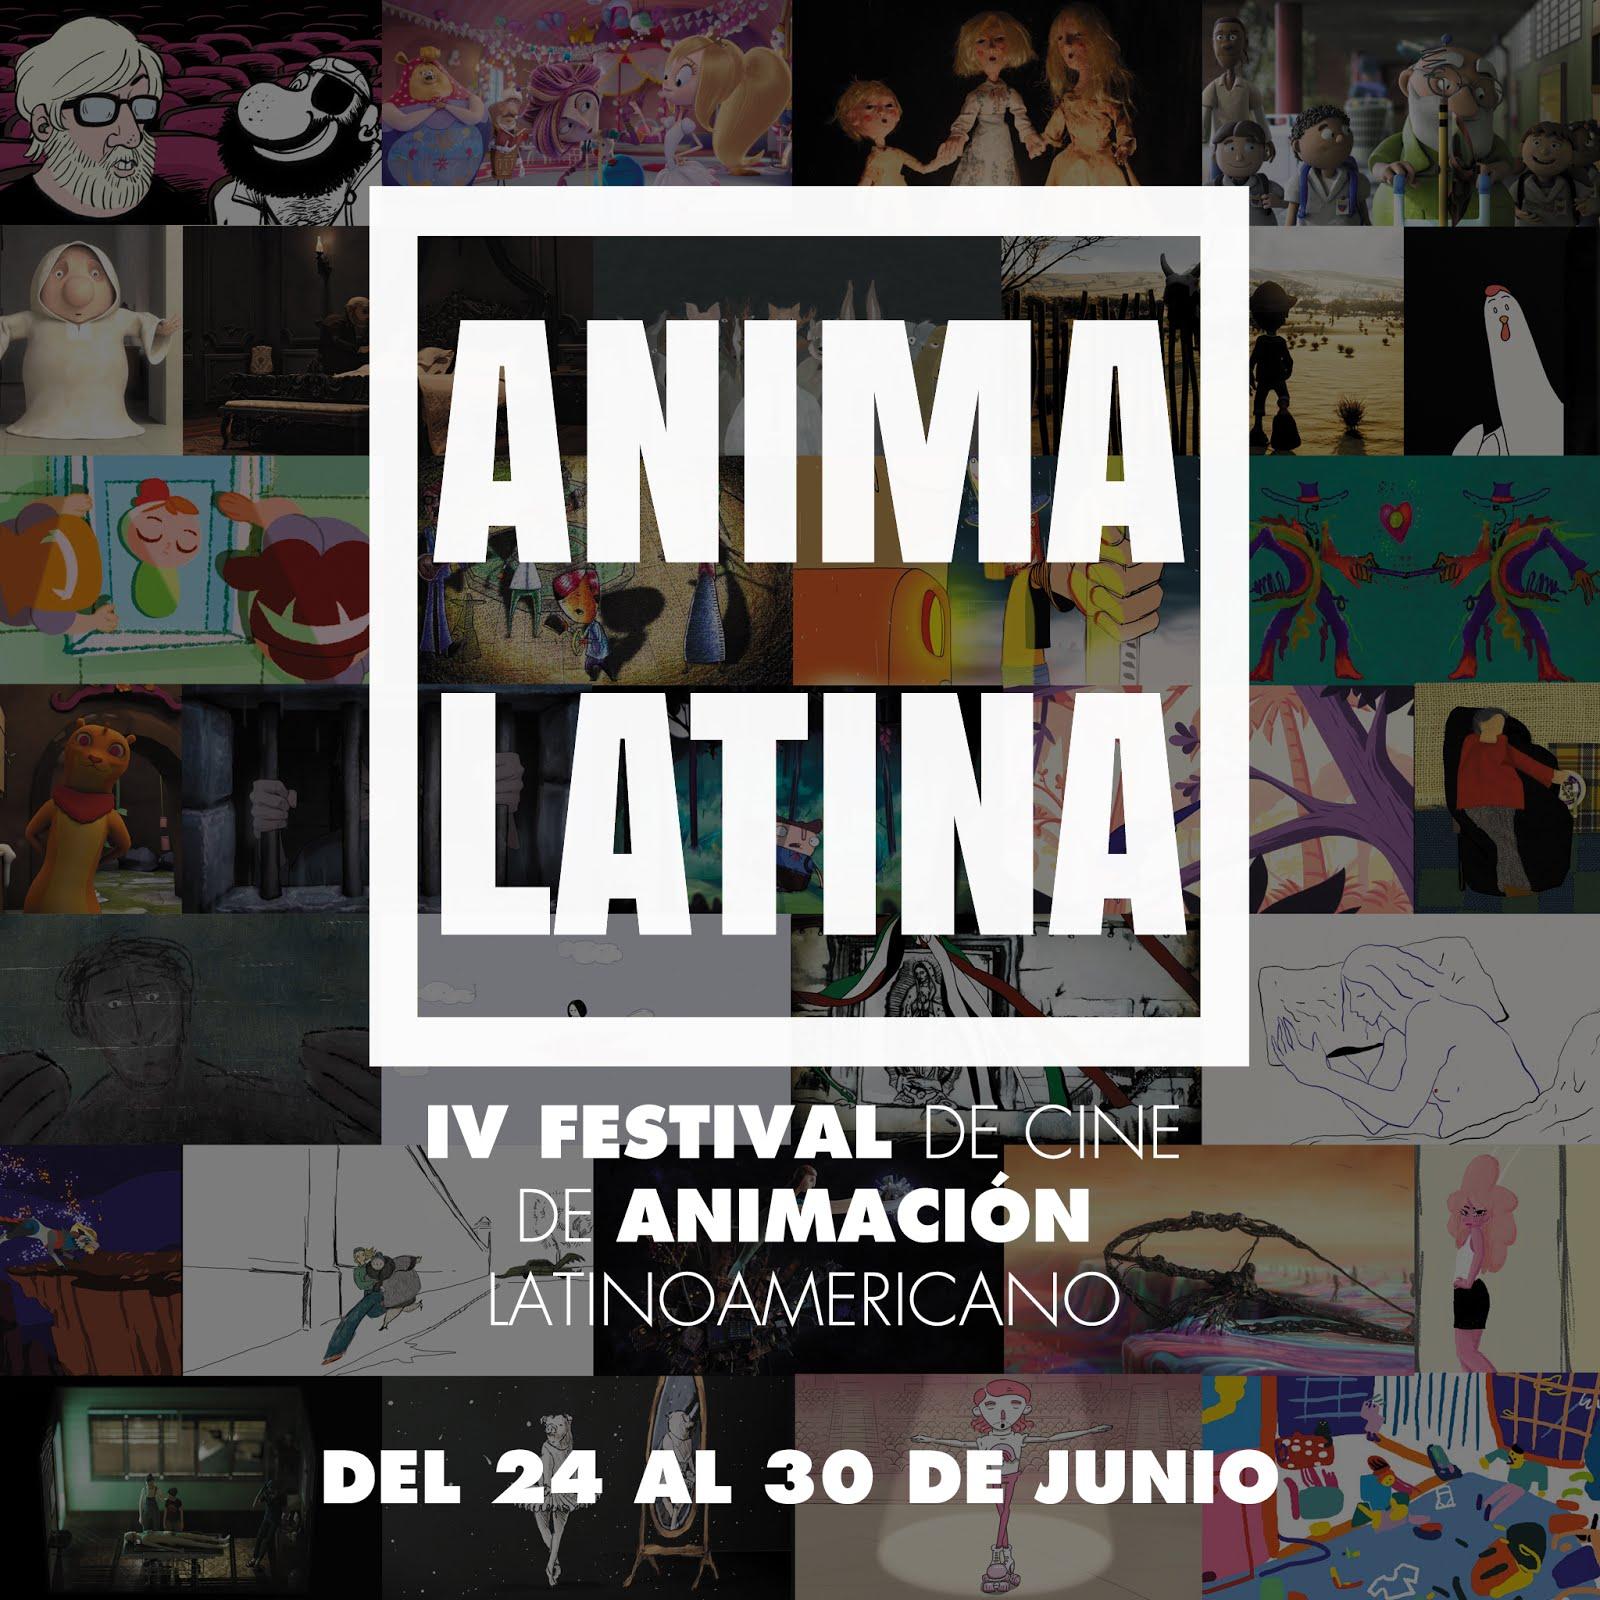 ANIMA LATINA, IV Festival de Cine de Animación Latinoamericano